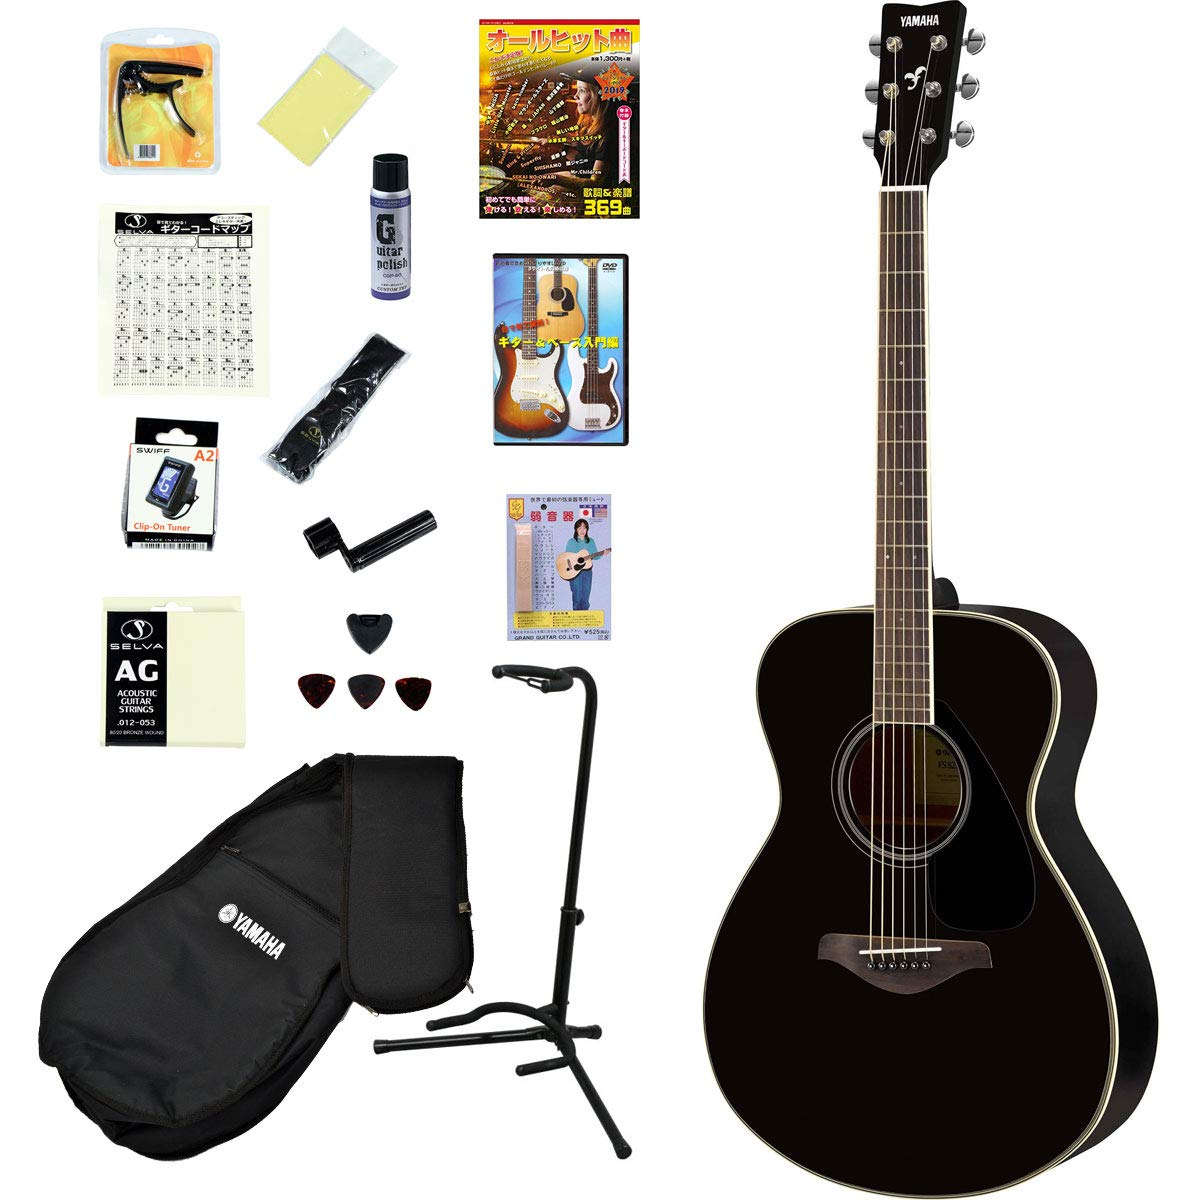 YAMAHA / FS820 BL(ブラック) 【オールヒット曲歌本17点入門セット】【楽譜が付いたお買い得セット】 ヤマハ アコースティックギター アコギ FS-820 入門 初心者   B07QJT4BD9